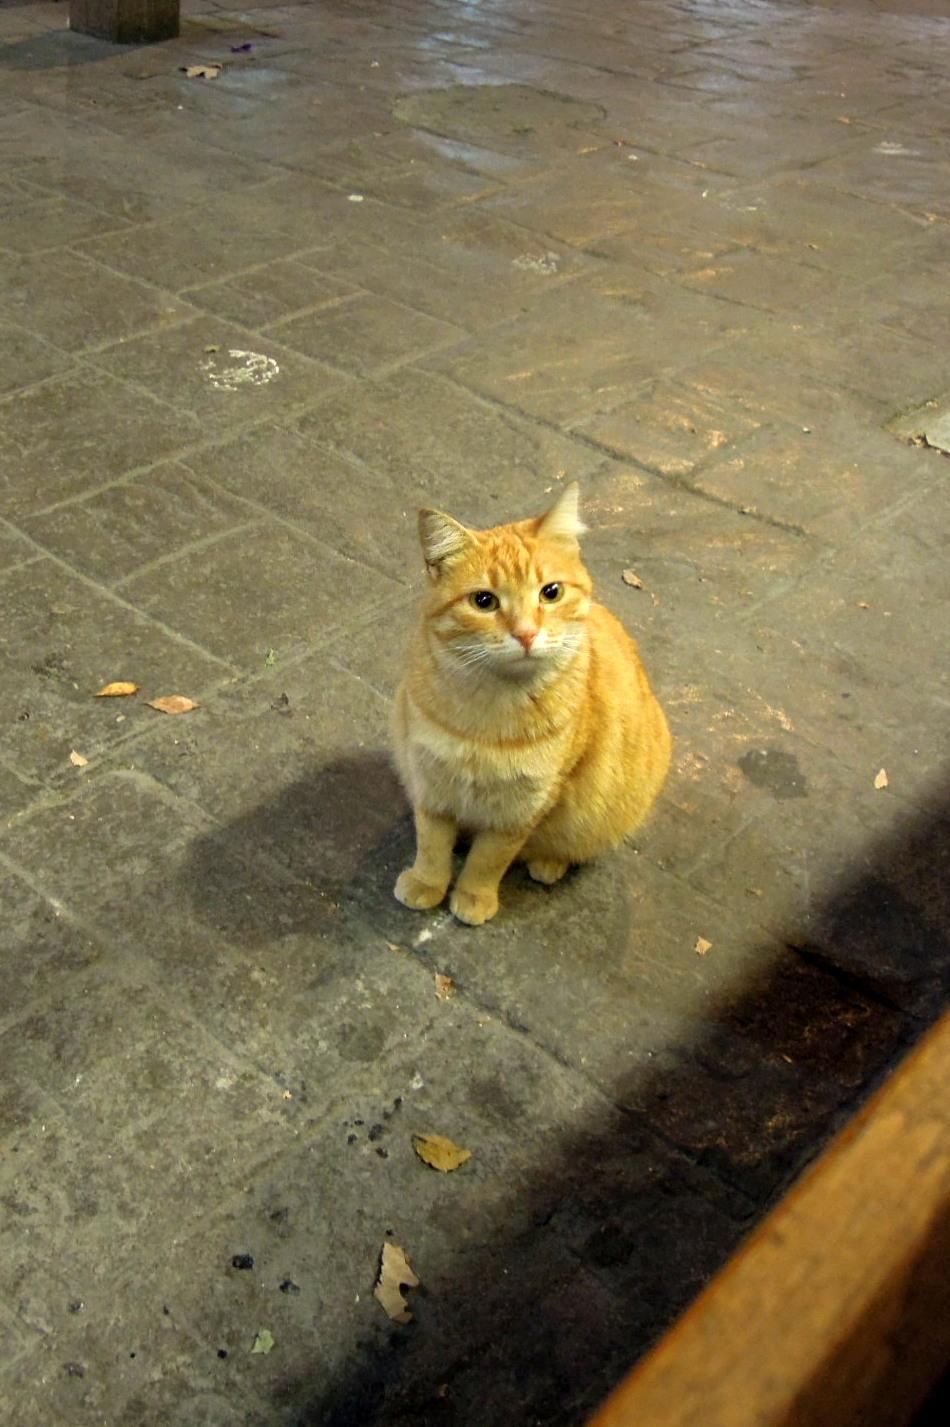 Orange cat with very cute face